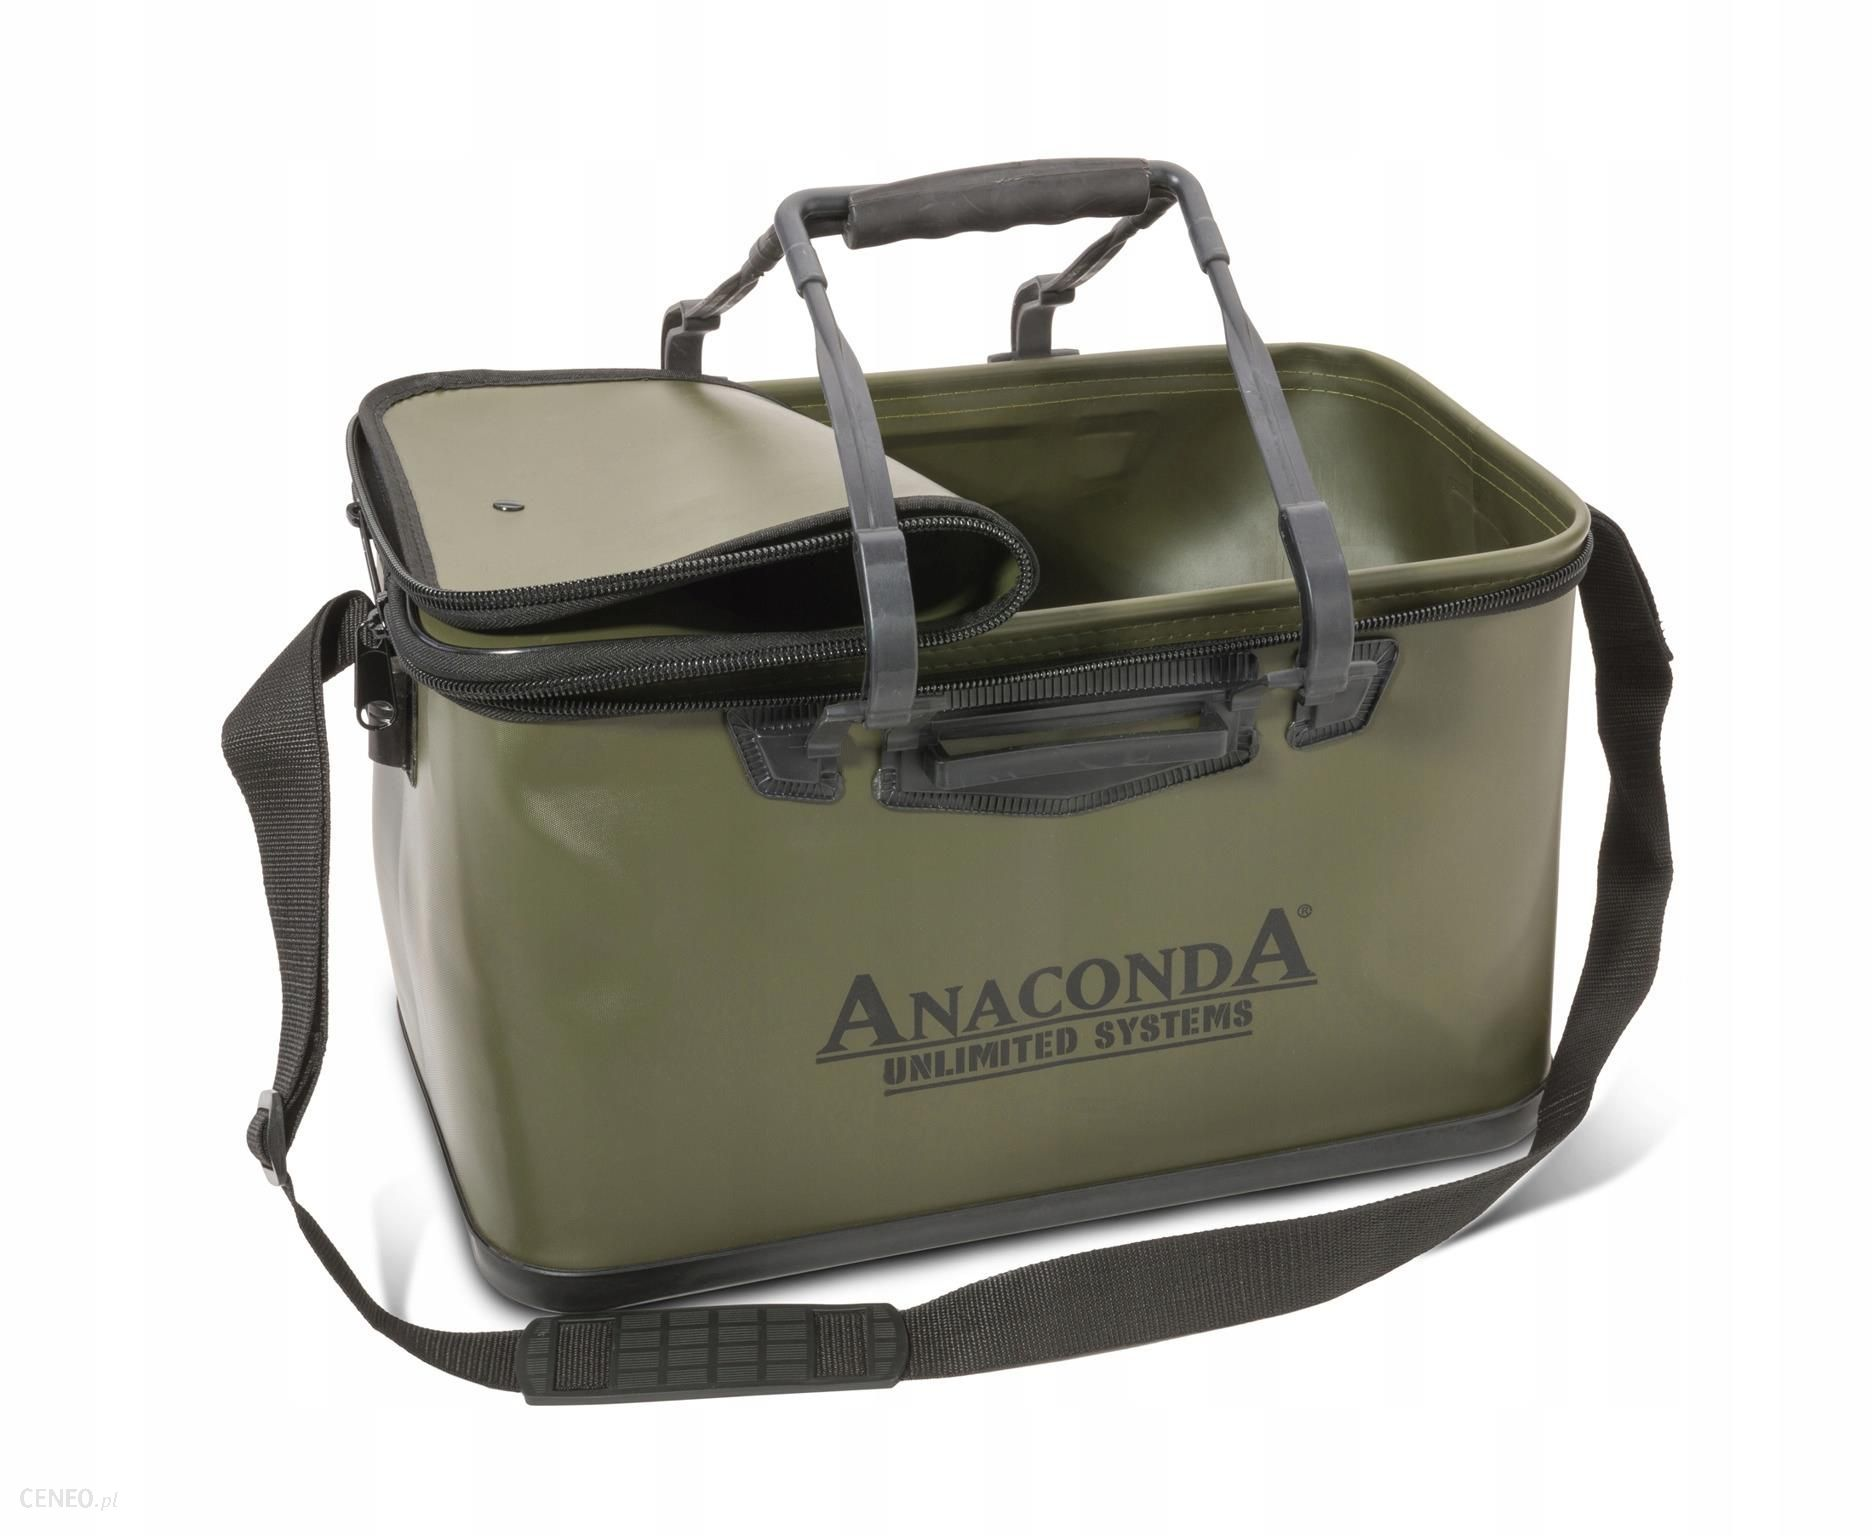 SANGER TORBA WODOODPORNA SANGER ANACONDA TANK M-30 7150101